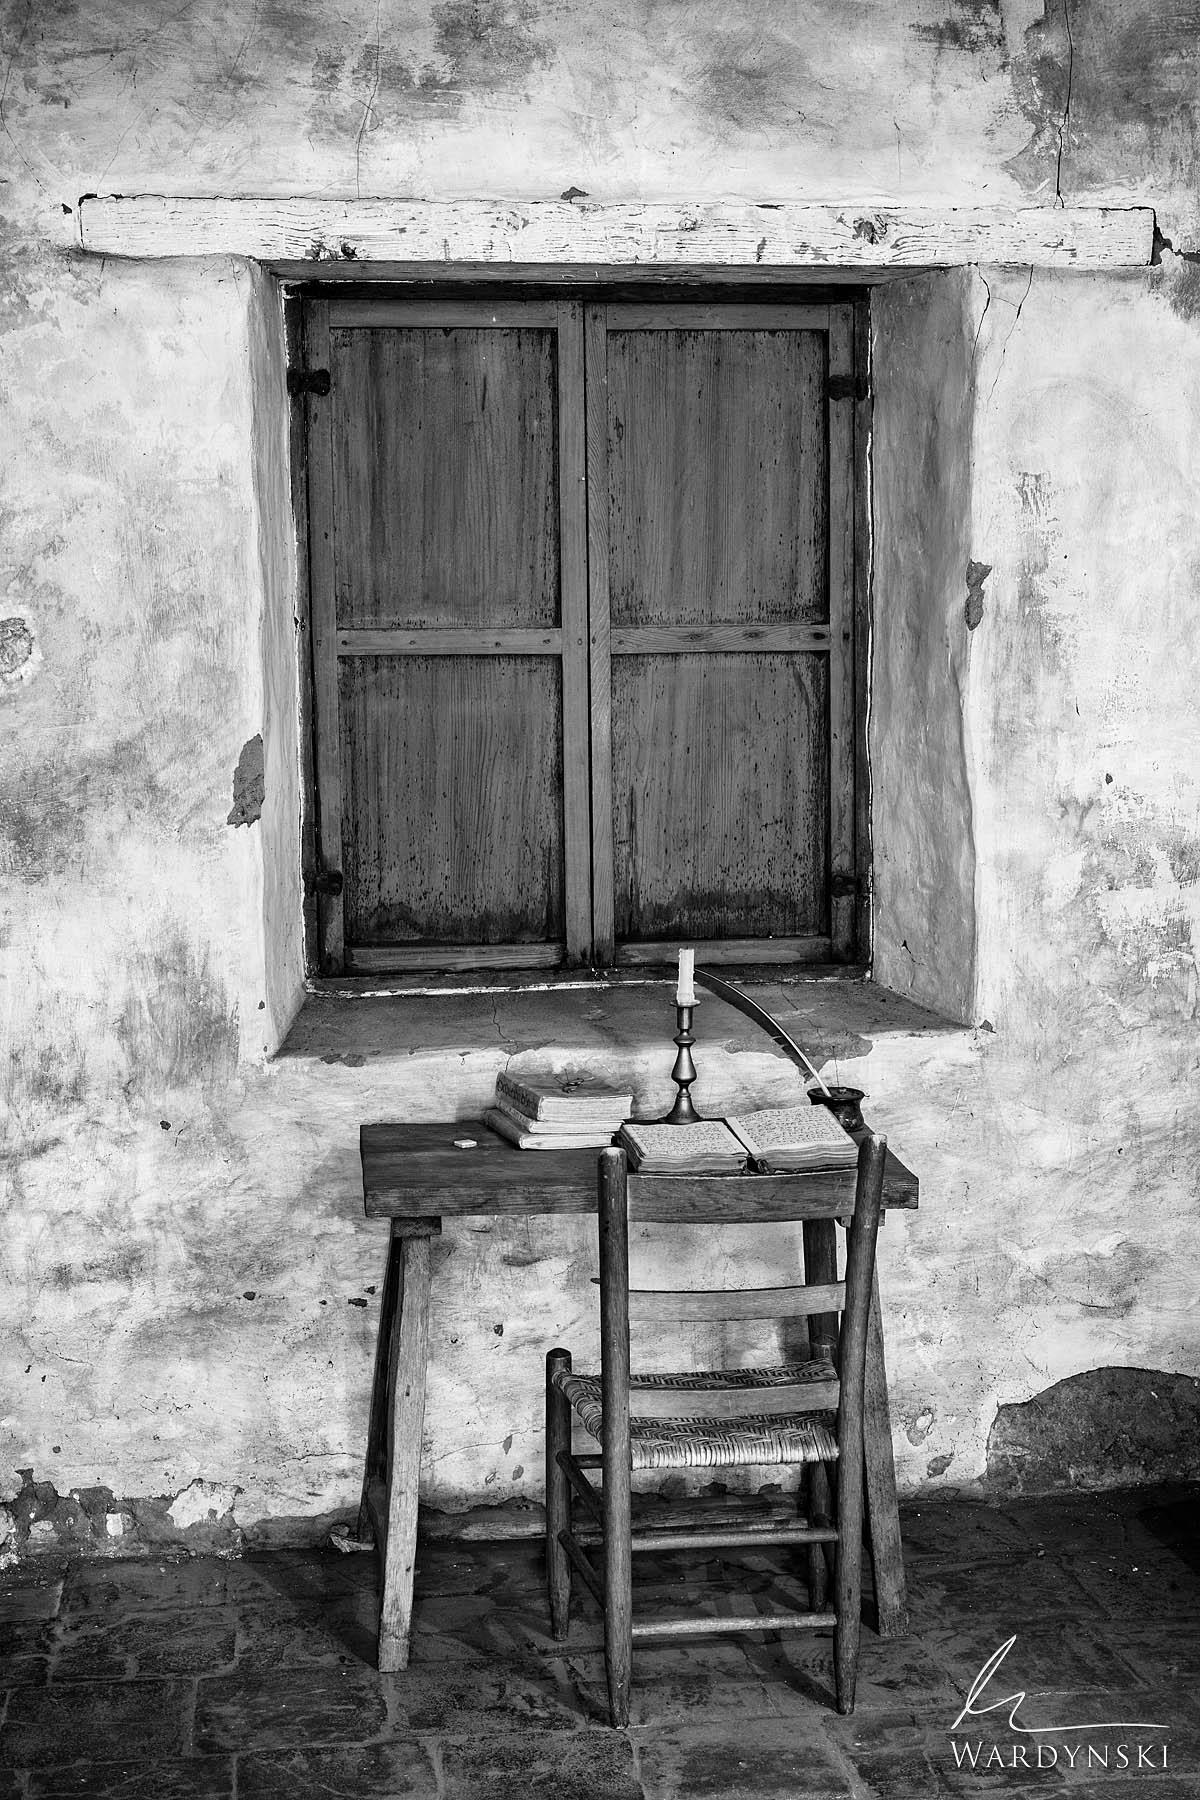 vertical, black and white, b&w, monochrome